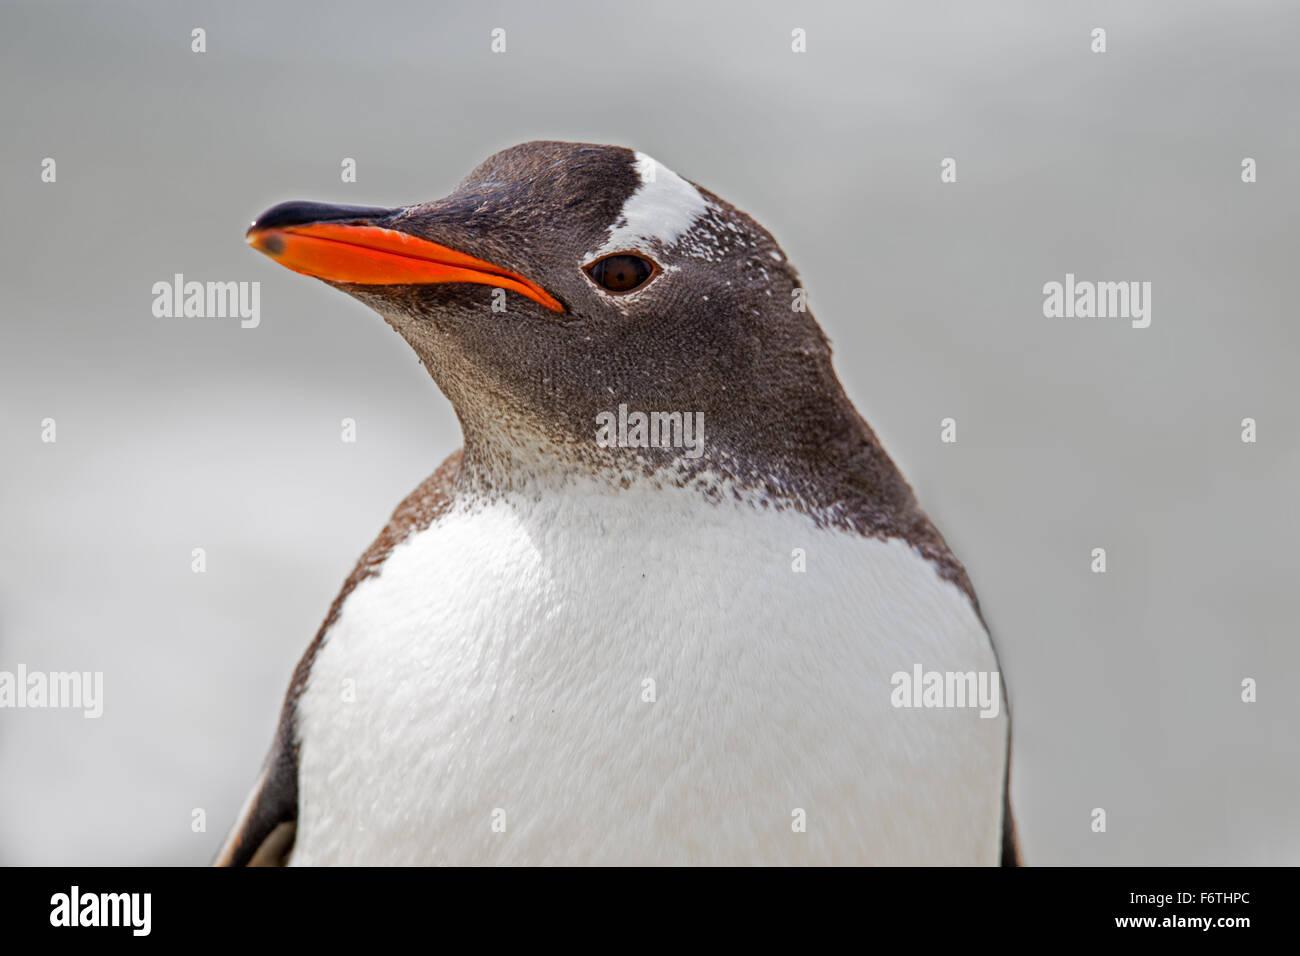 Gentoo pingouin portrait close up. Îles Falkland Photo Stock